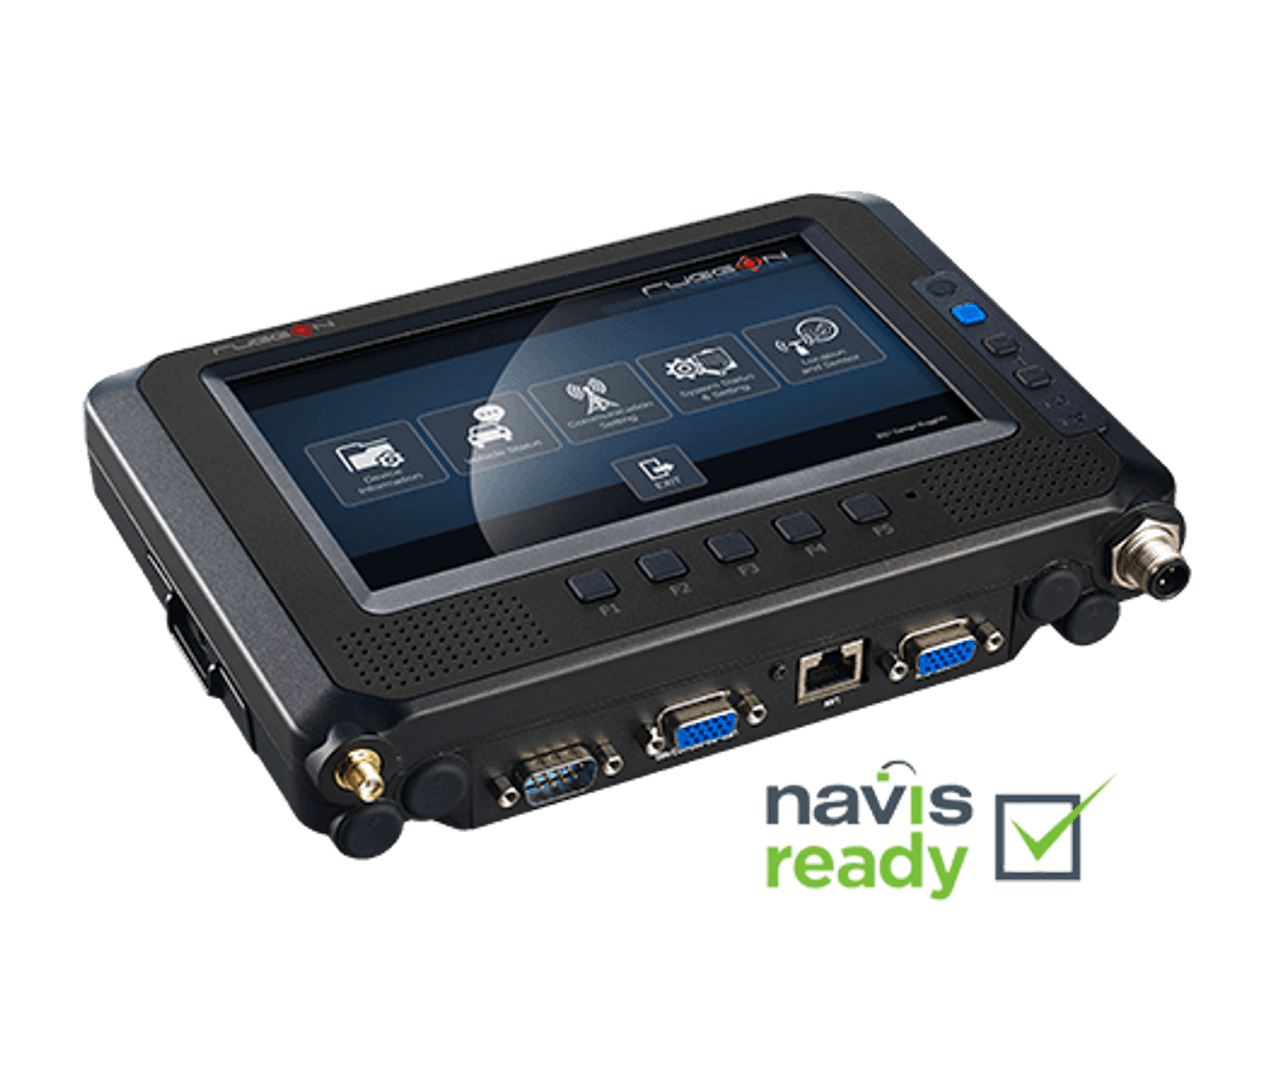 "RuggON MT7000 7""Mobile Data Terminal base view, Navis ready"